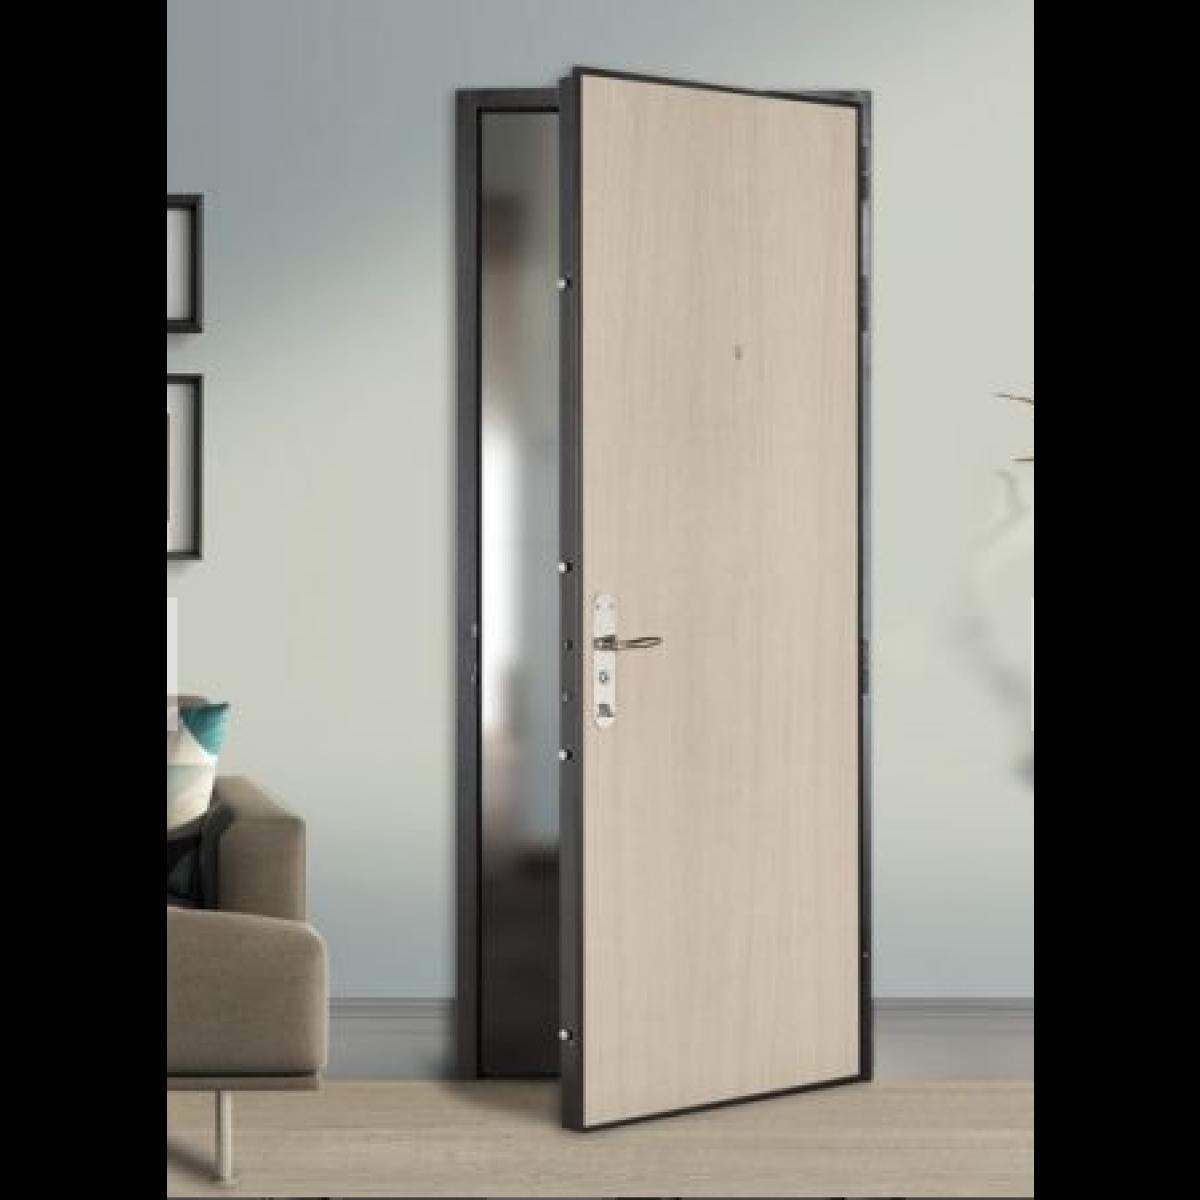 porte coupe feu ei30. Black Bedroom Furniture Sets. Home Design Ideas